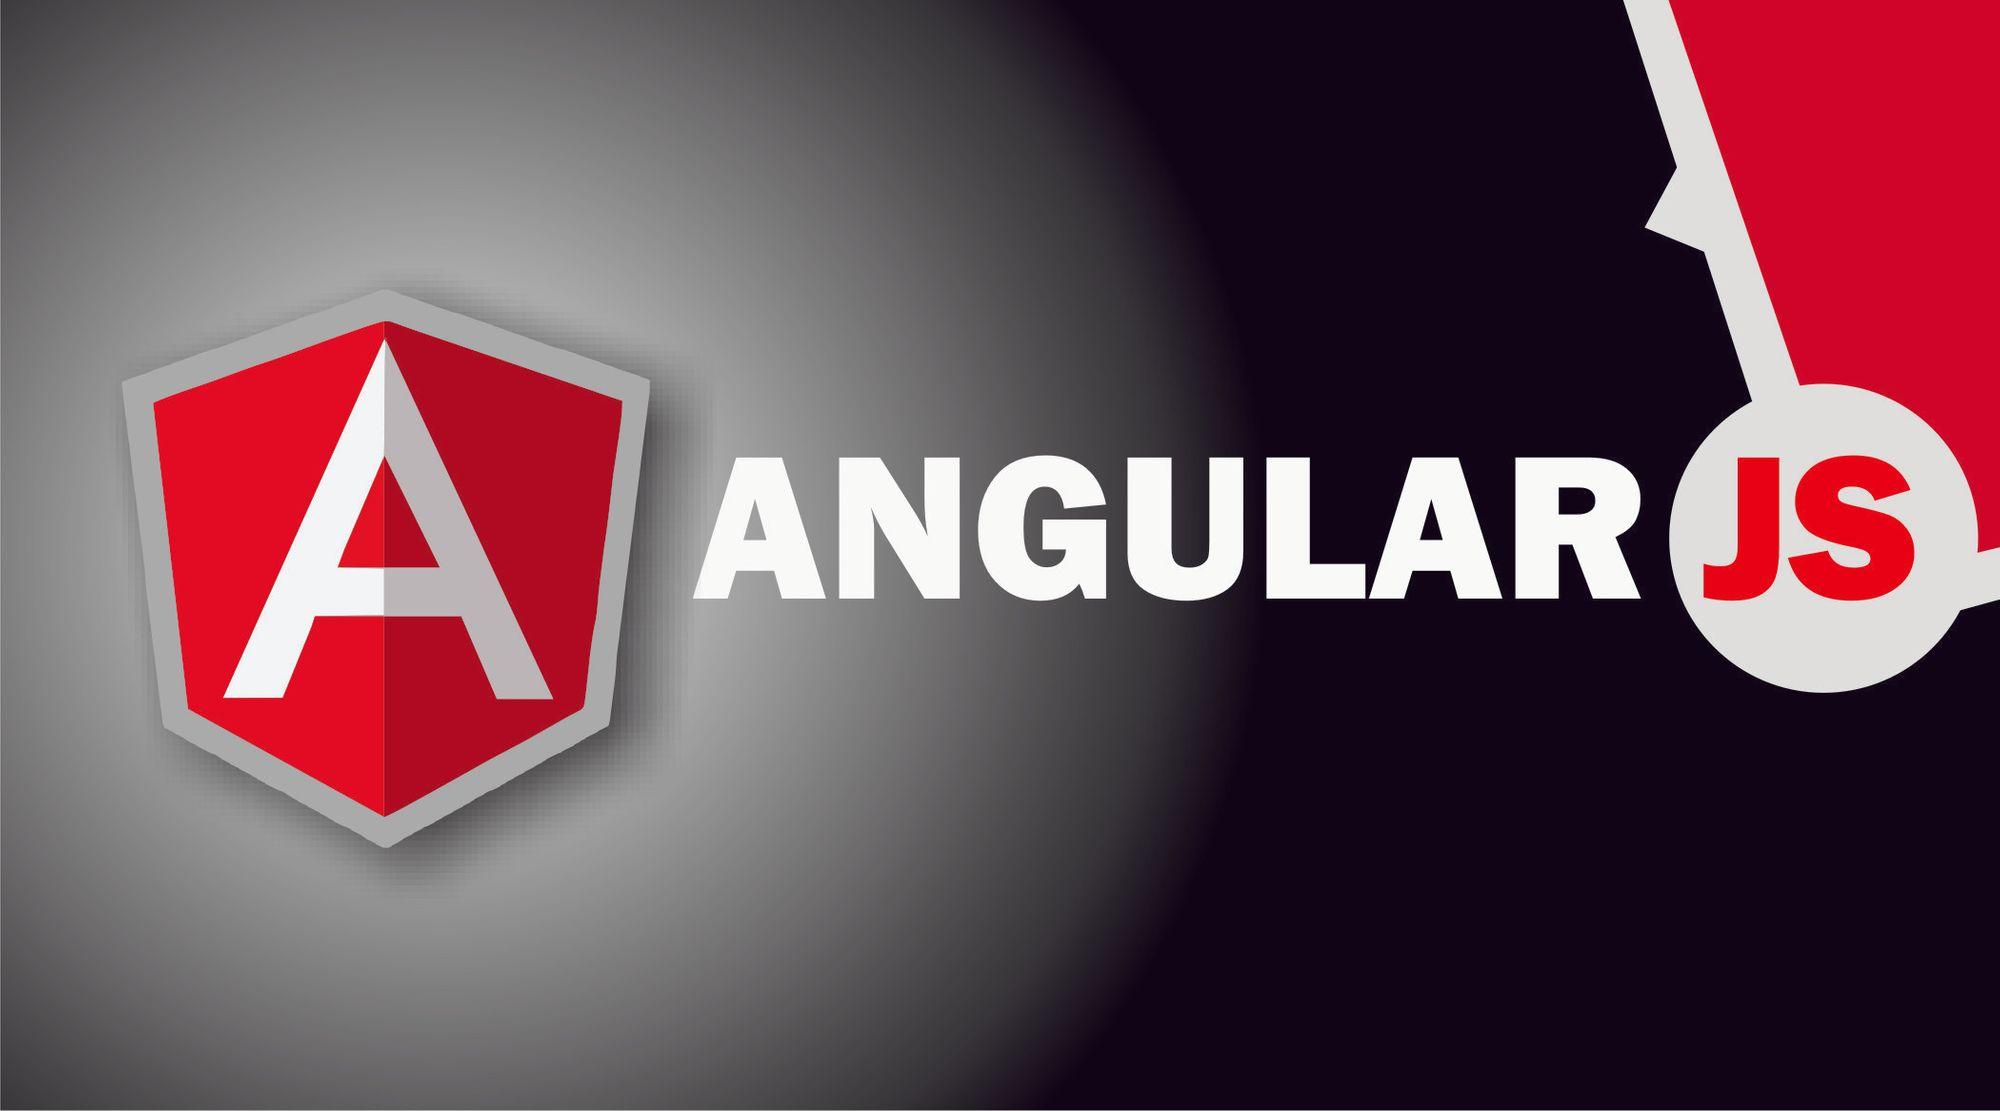 Angular.js (Front-end)